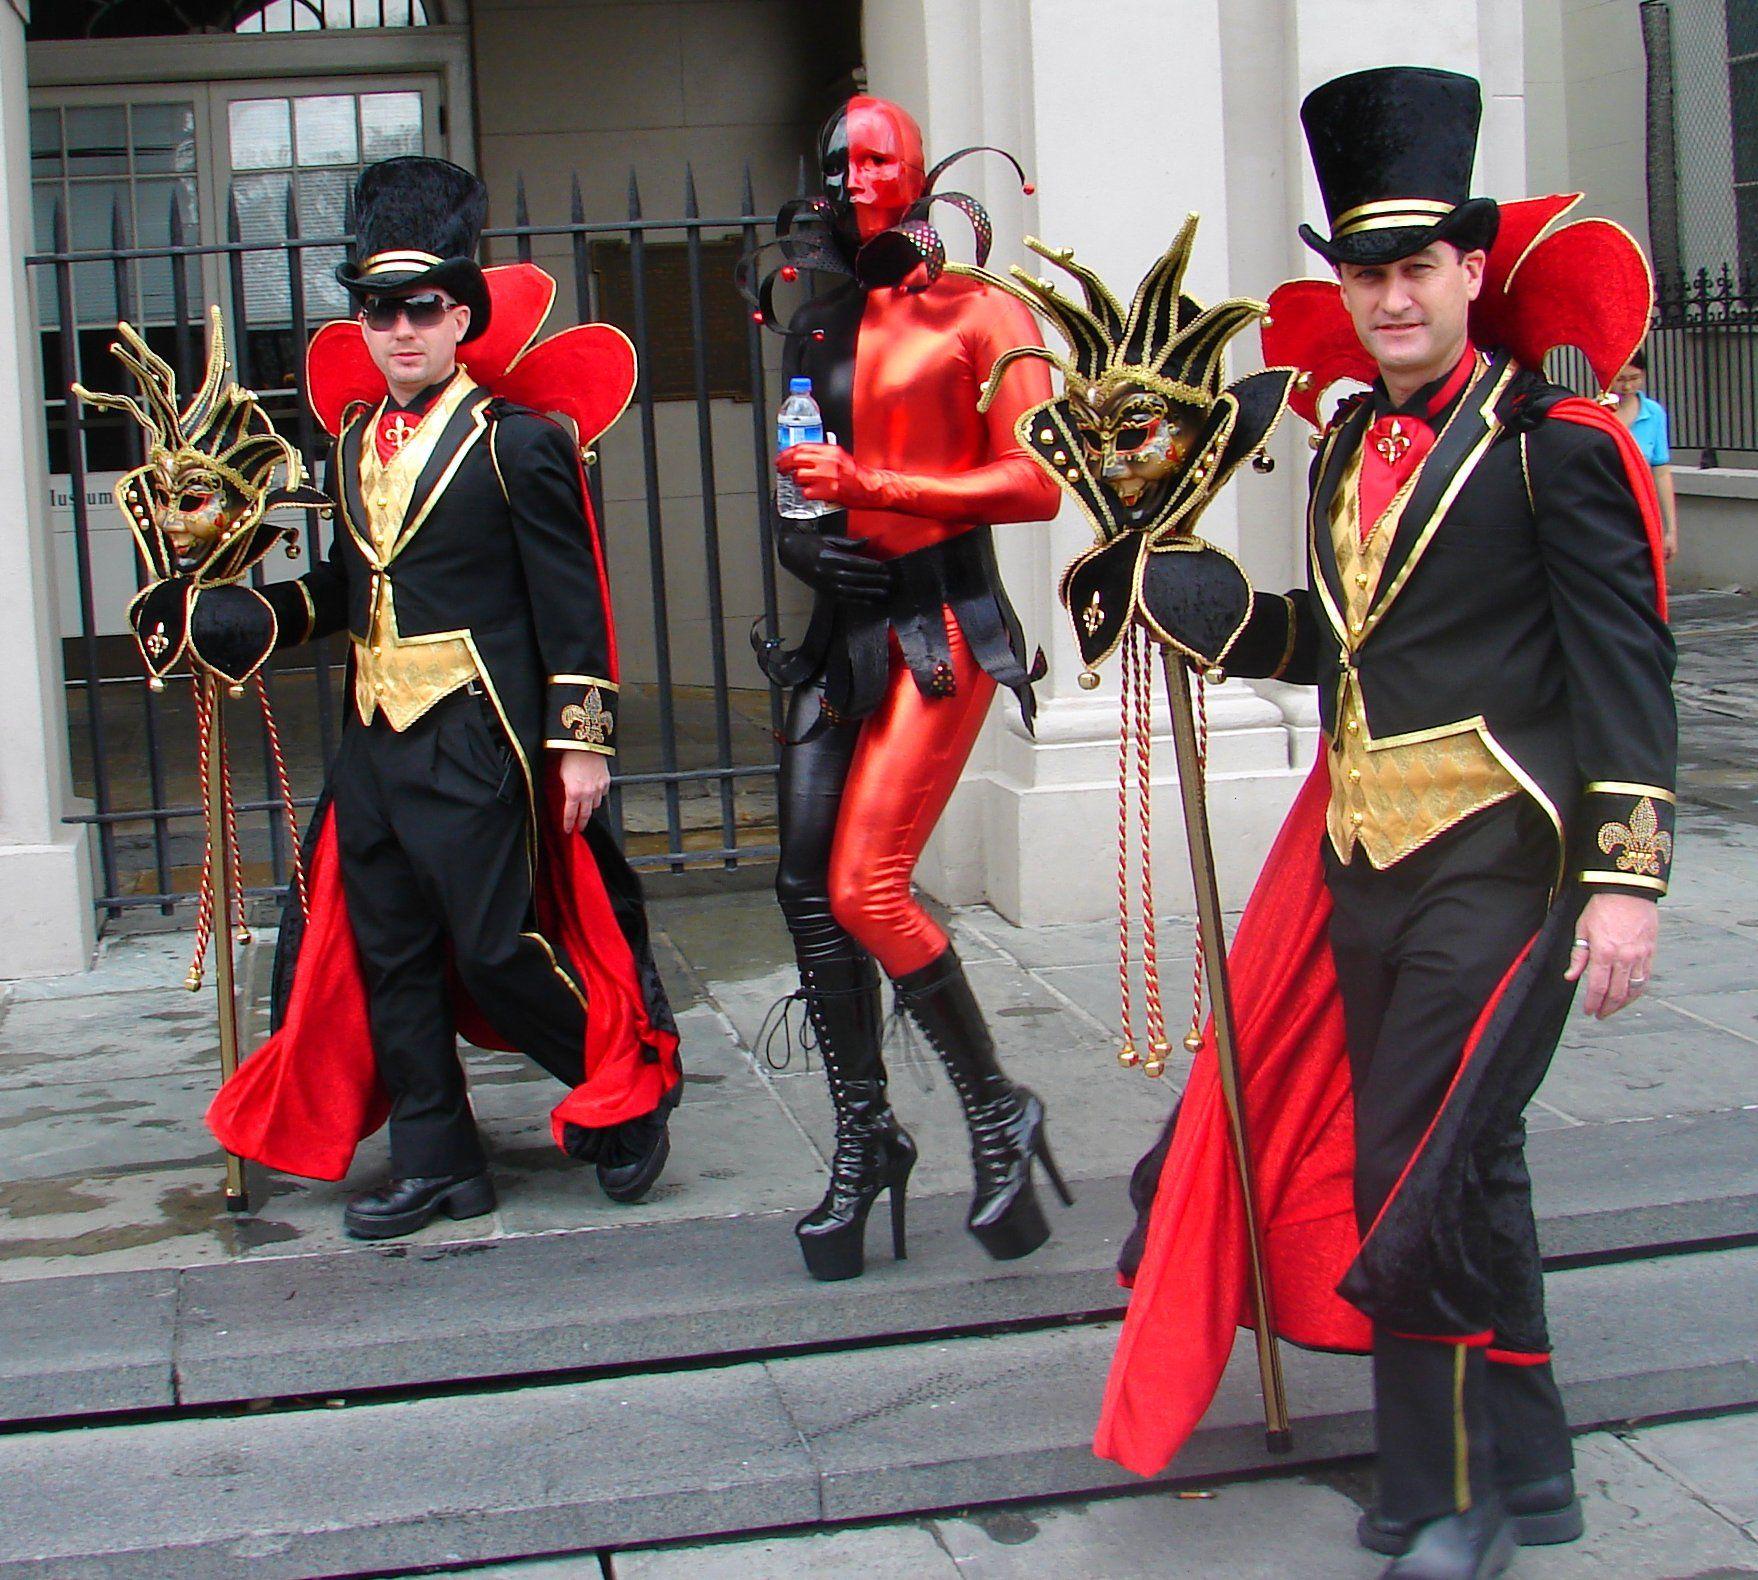 Mardi Gras Costumes | Mardi Gras Costume Inspiration | Pinterest ...